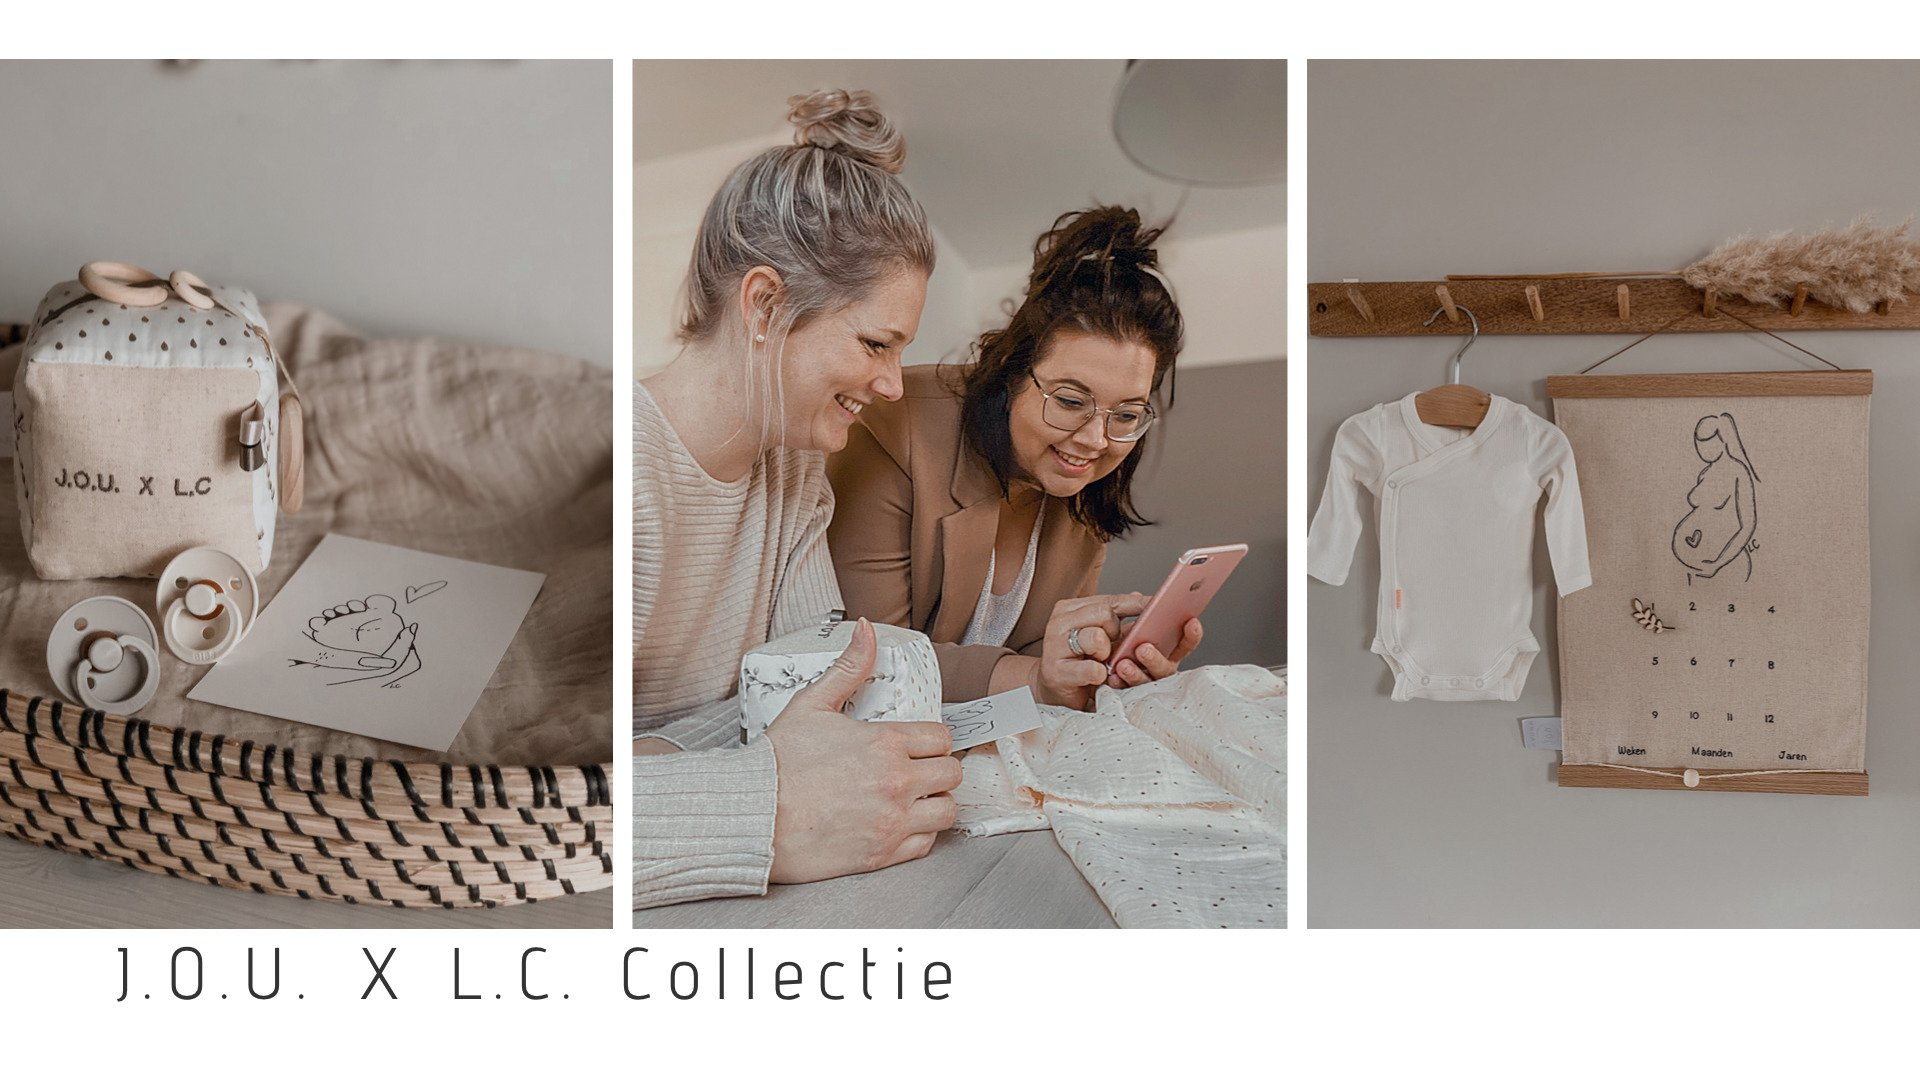 J.O.U. X L.C. Collectie